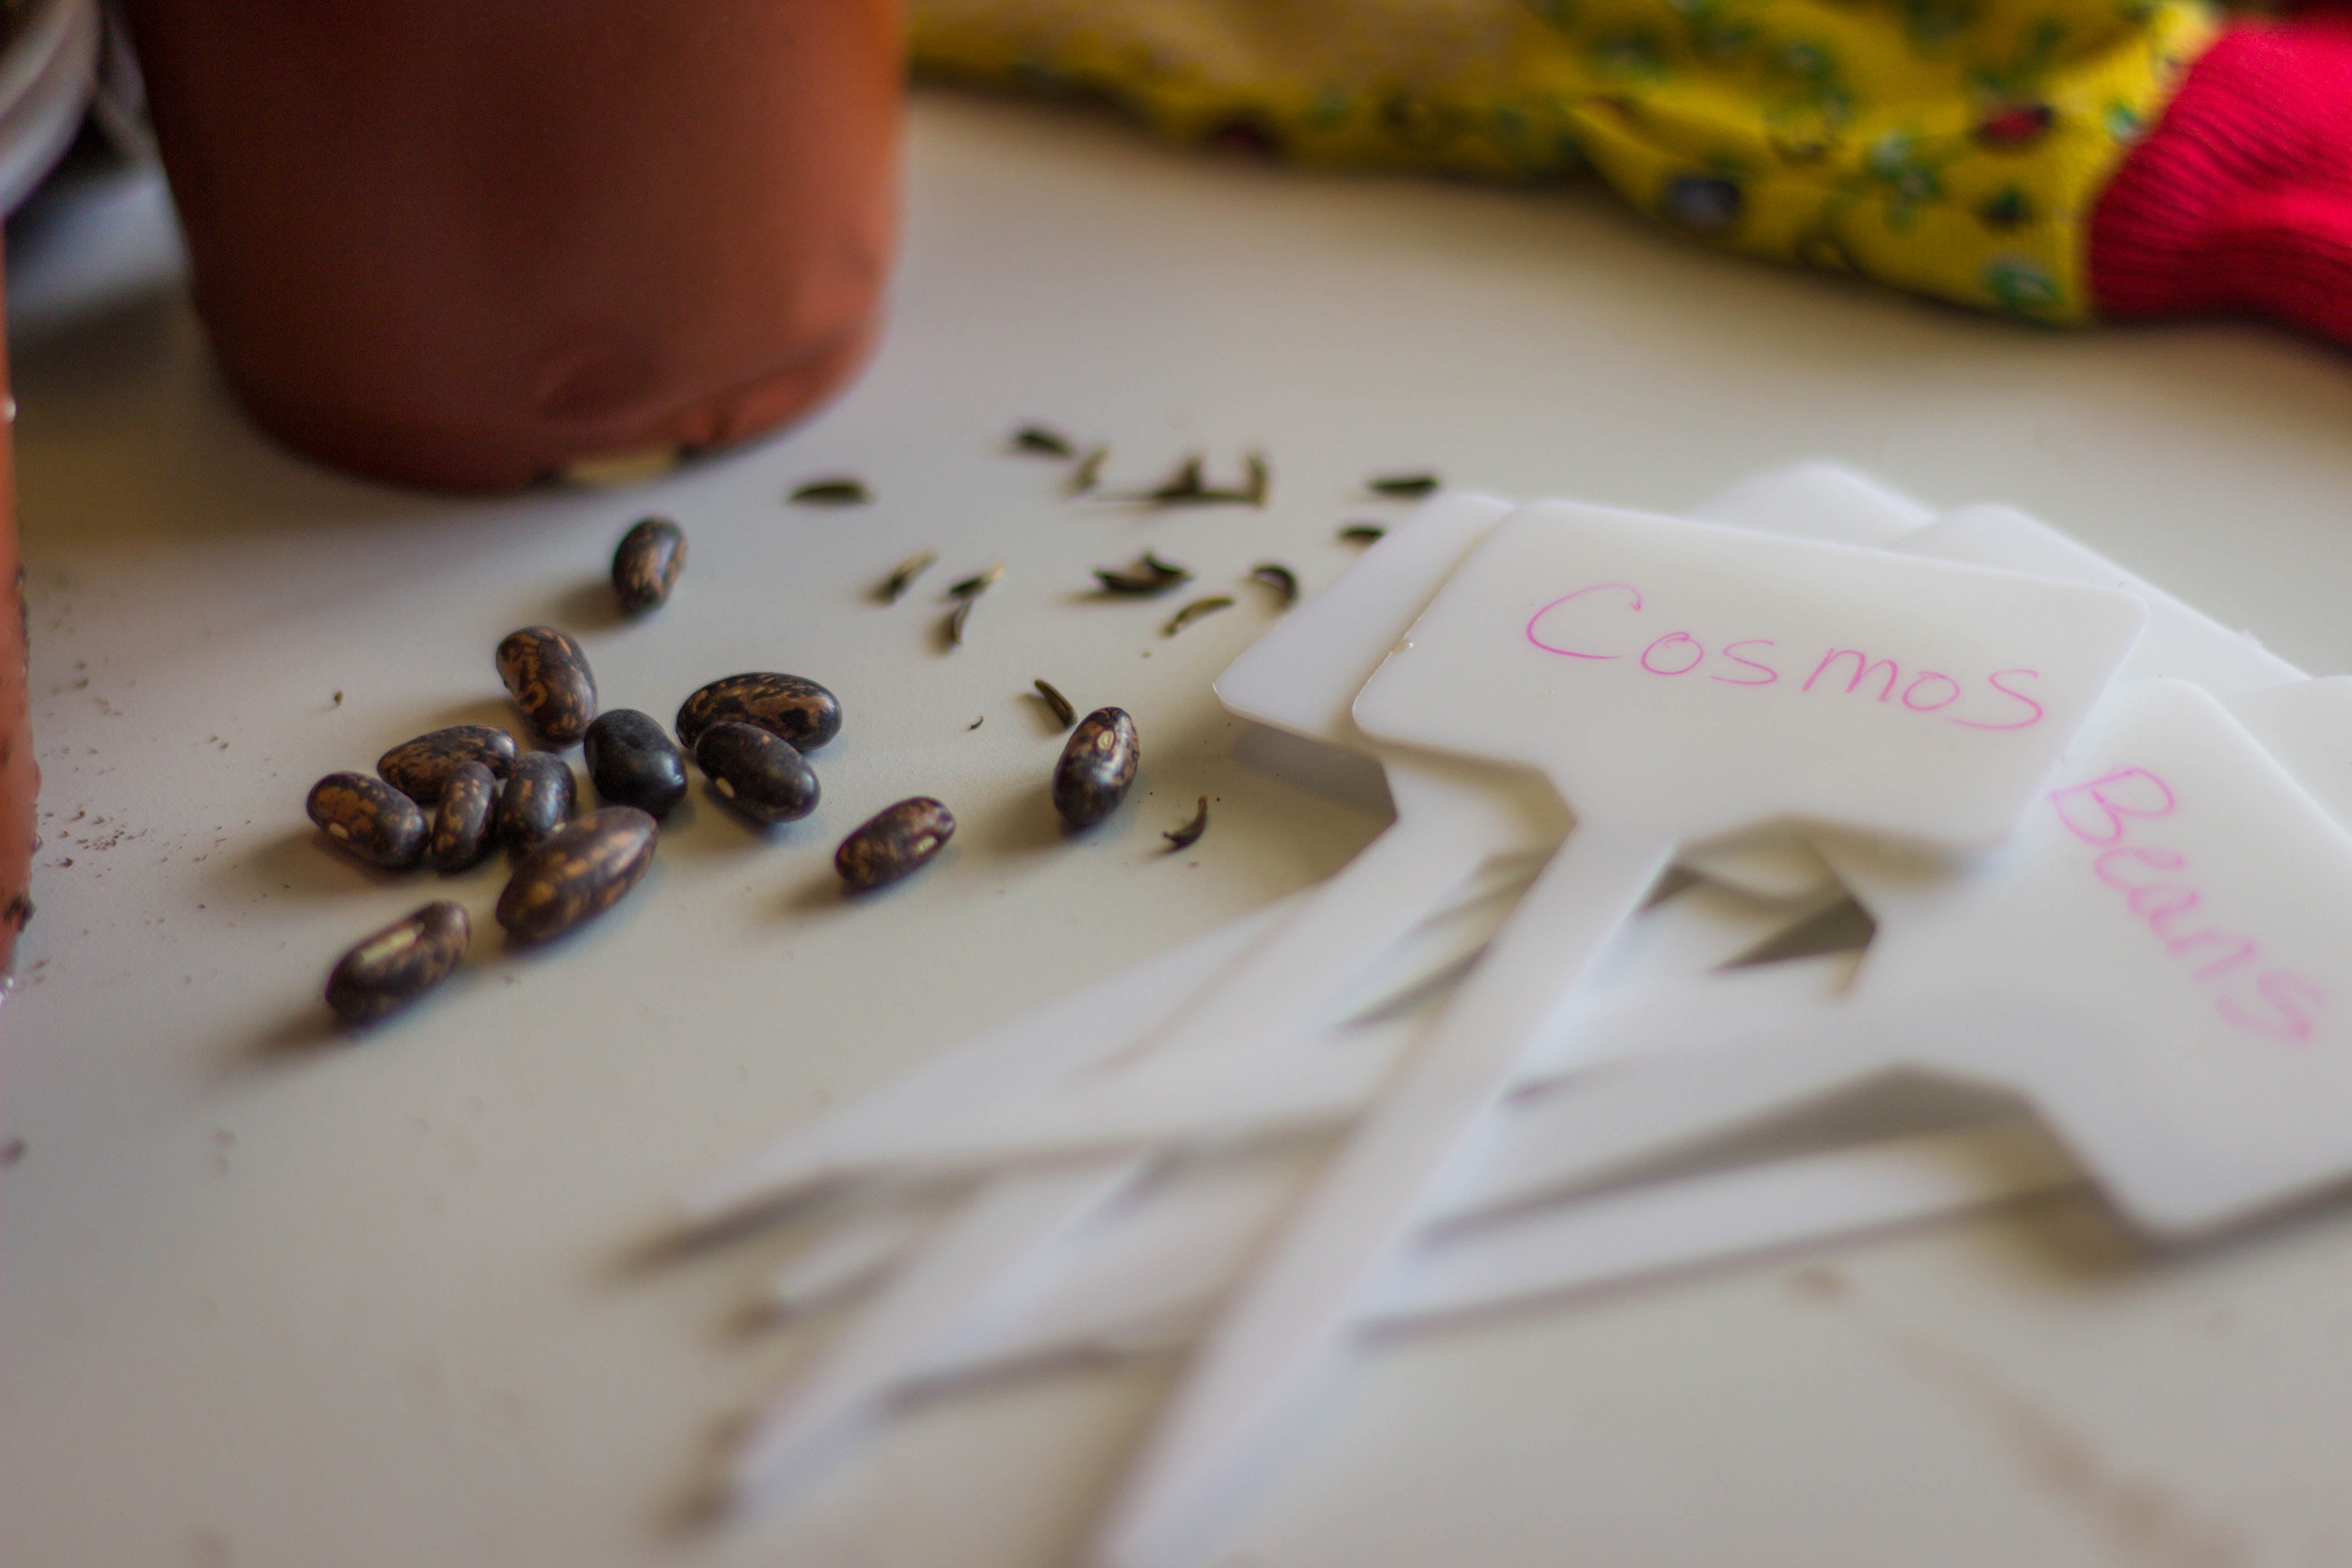 Buy seeds, Not Plants